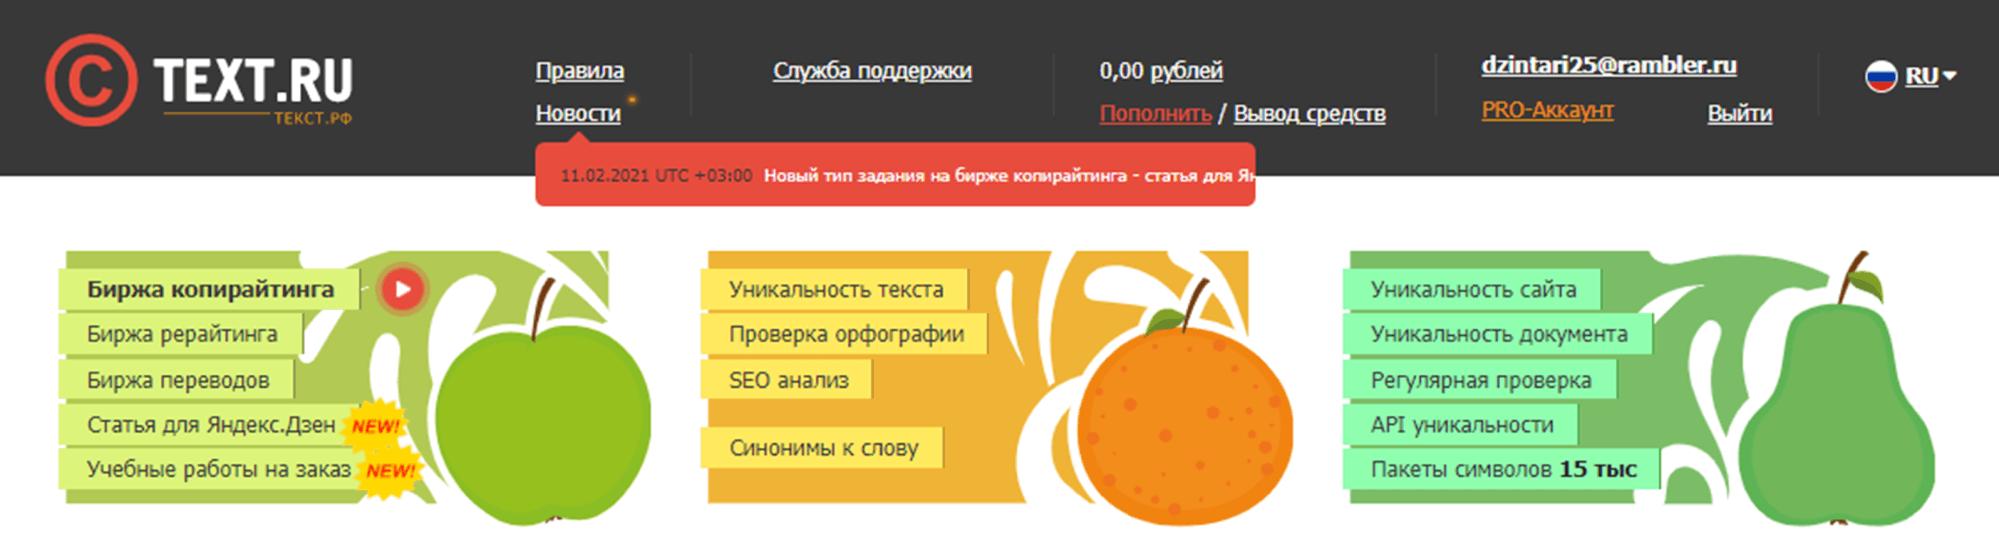 Открываем сайт